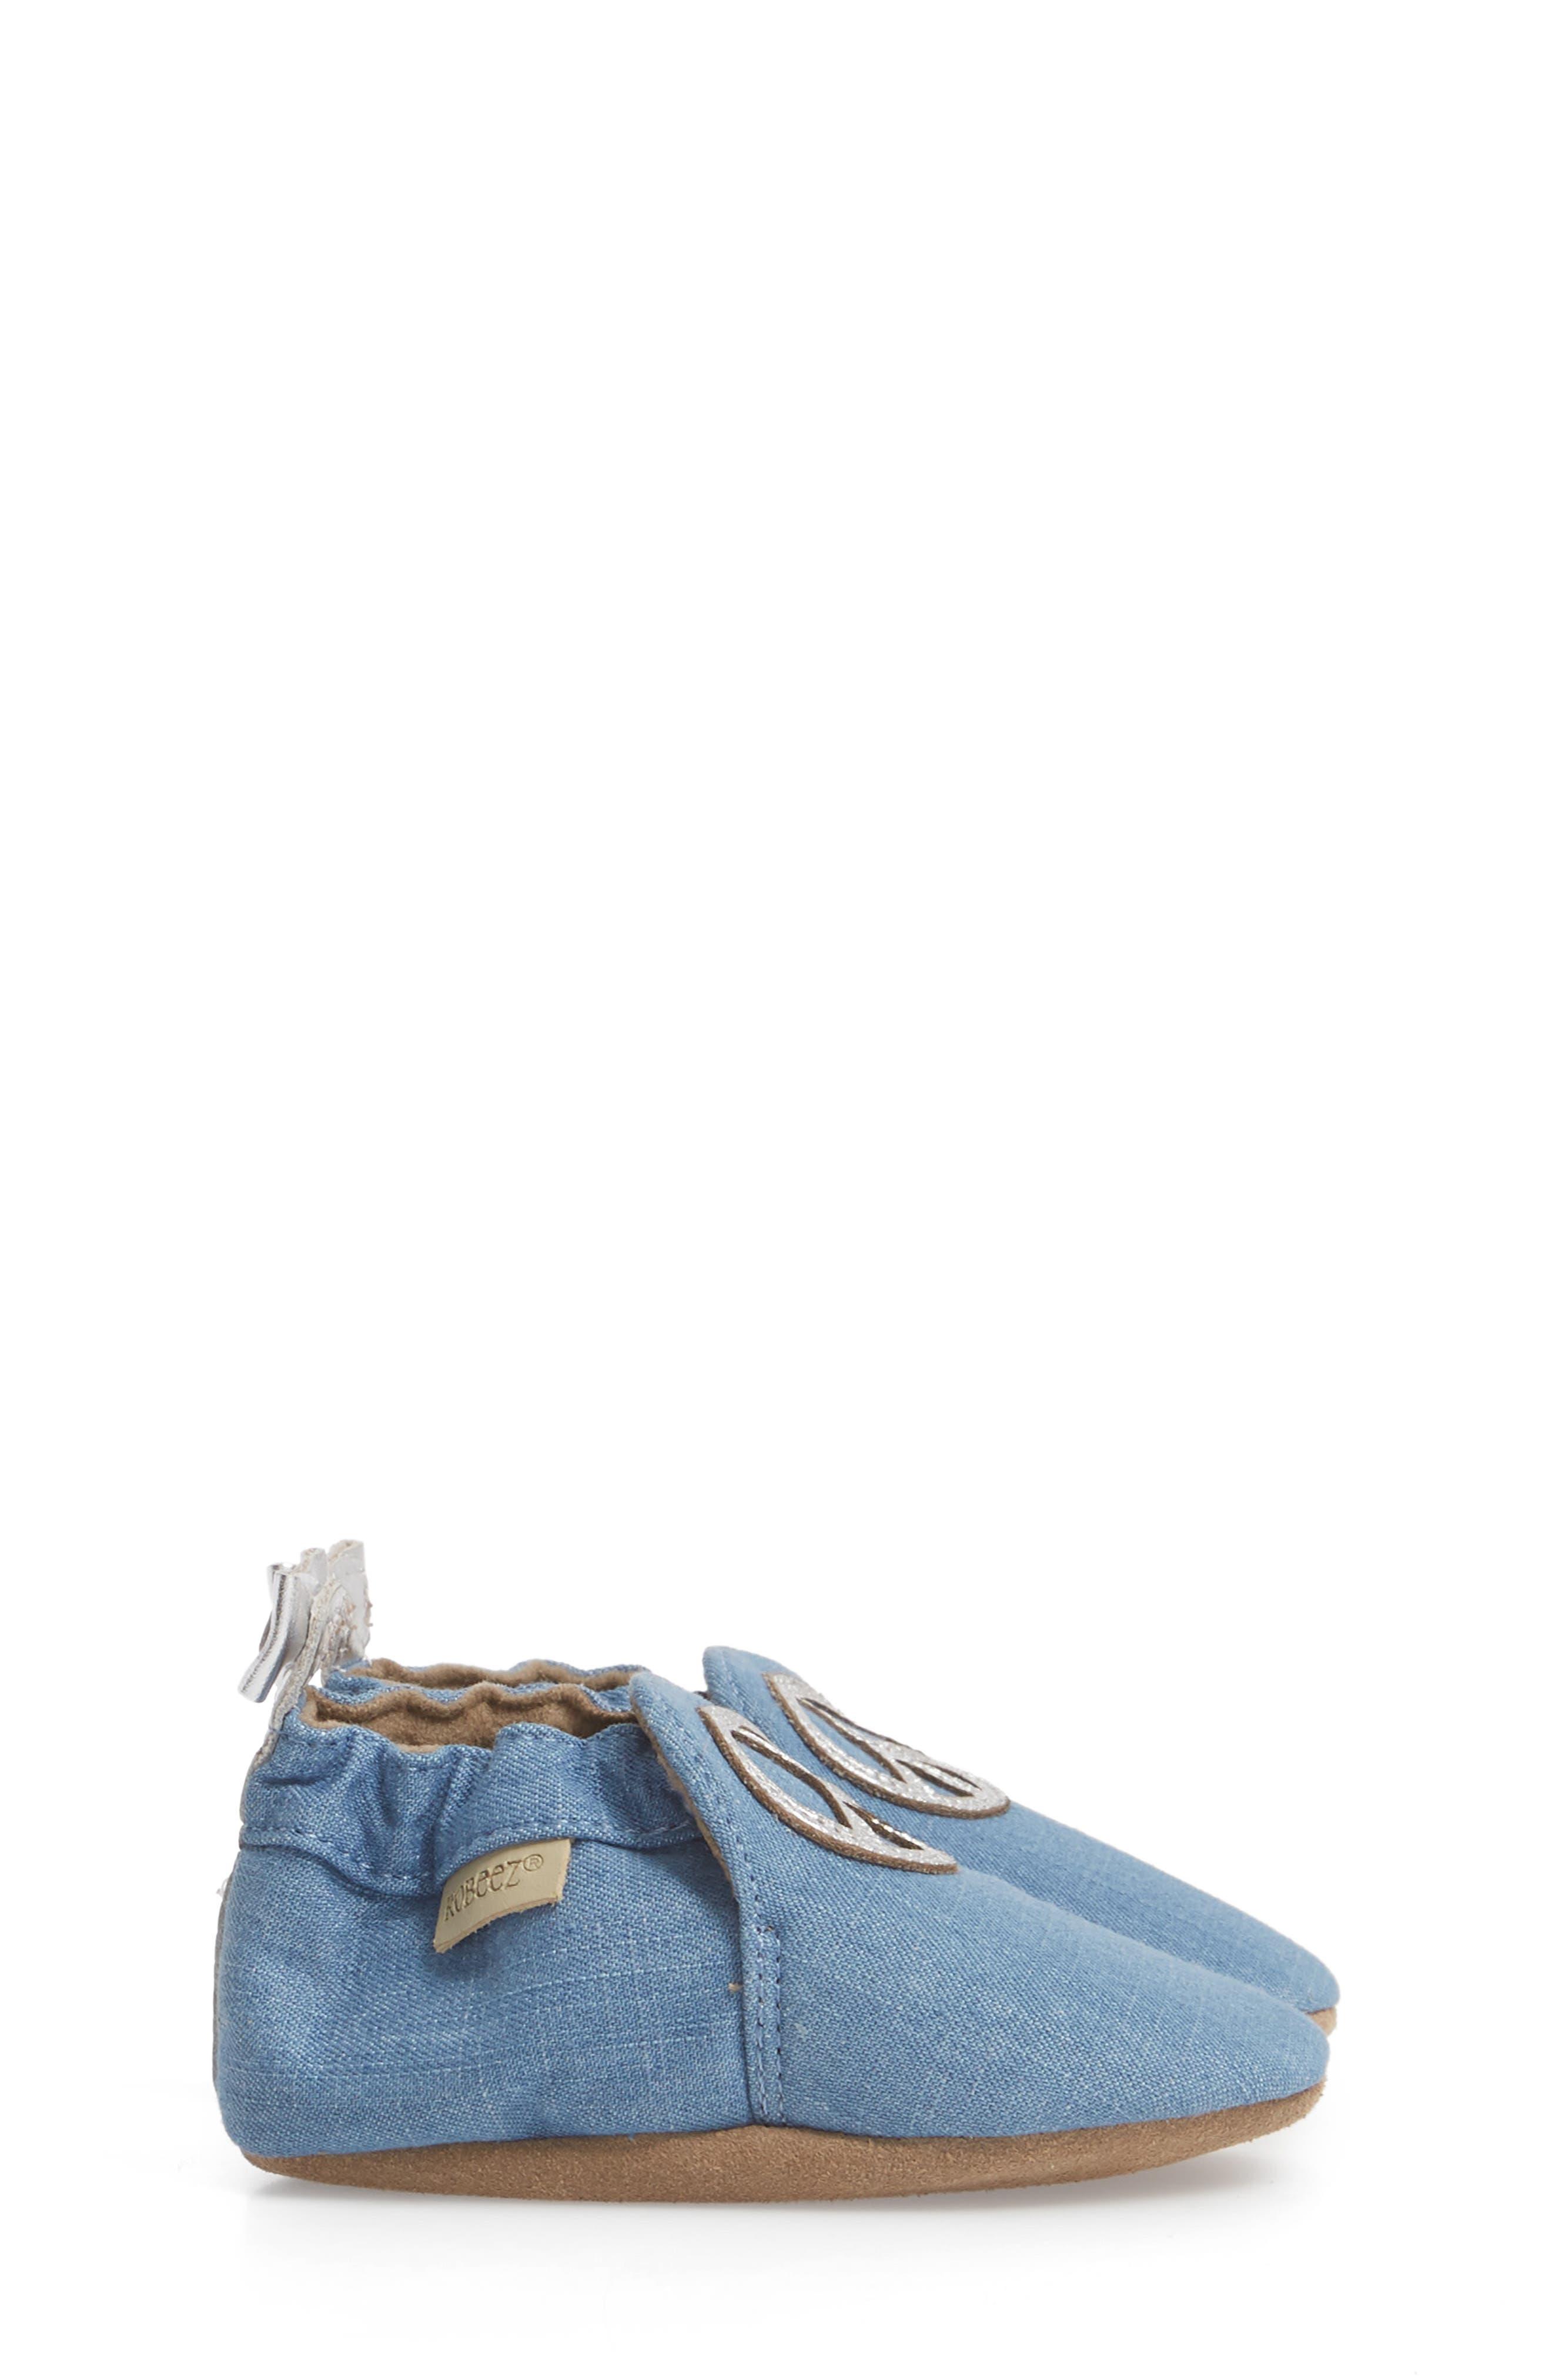 Peace Out Moccasin Crib Shoe,                             Alternate thumbnail 4, color,                             Blue